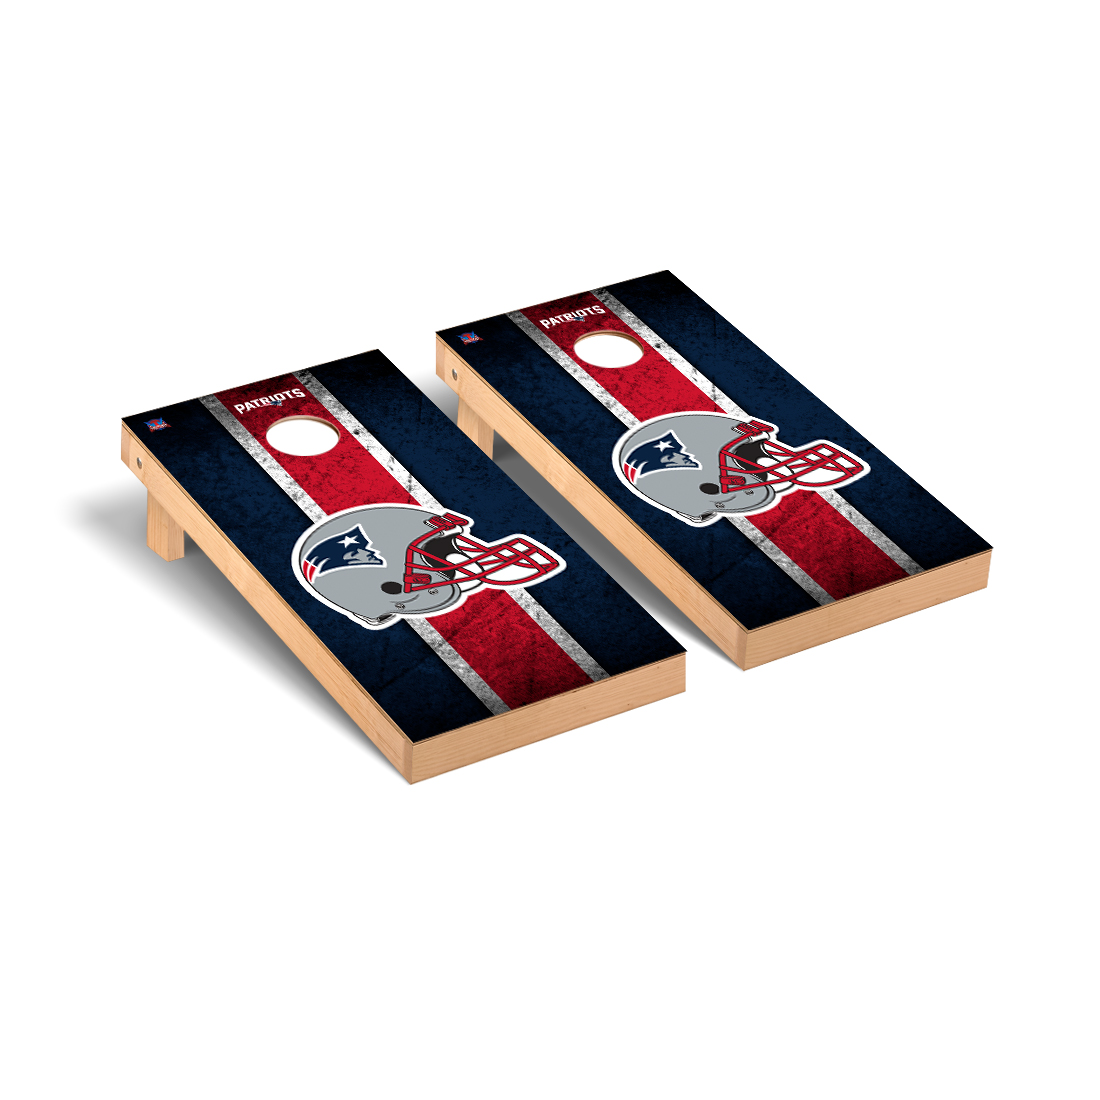 New England Patriots NFL Football Cornhole Game Set Vintage Version